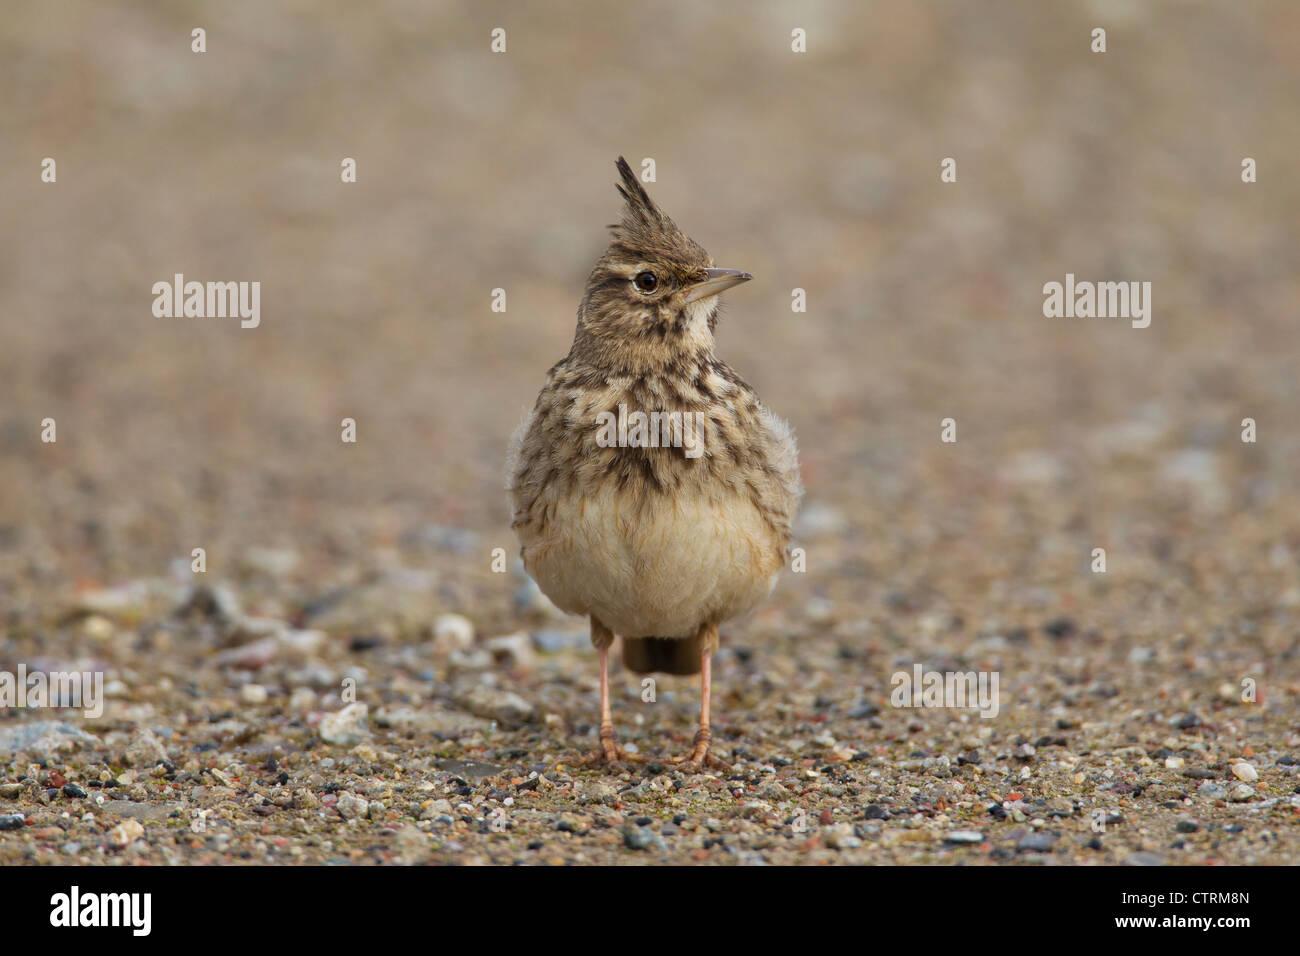 Galerida cristata Crested lark (mâle) assis sur le sol, Allemagne Photo Stock